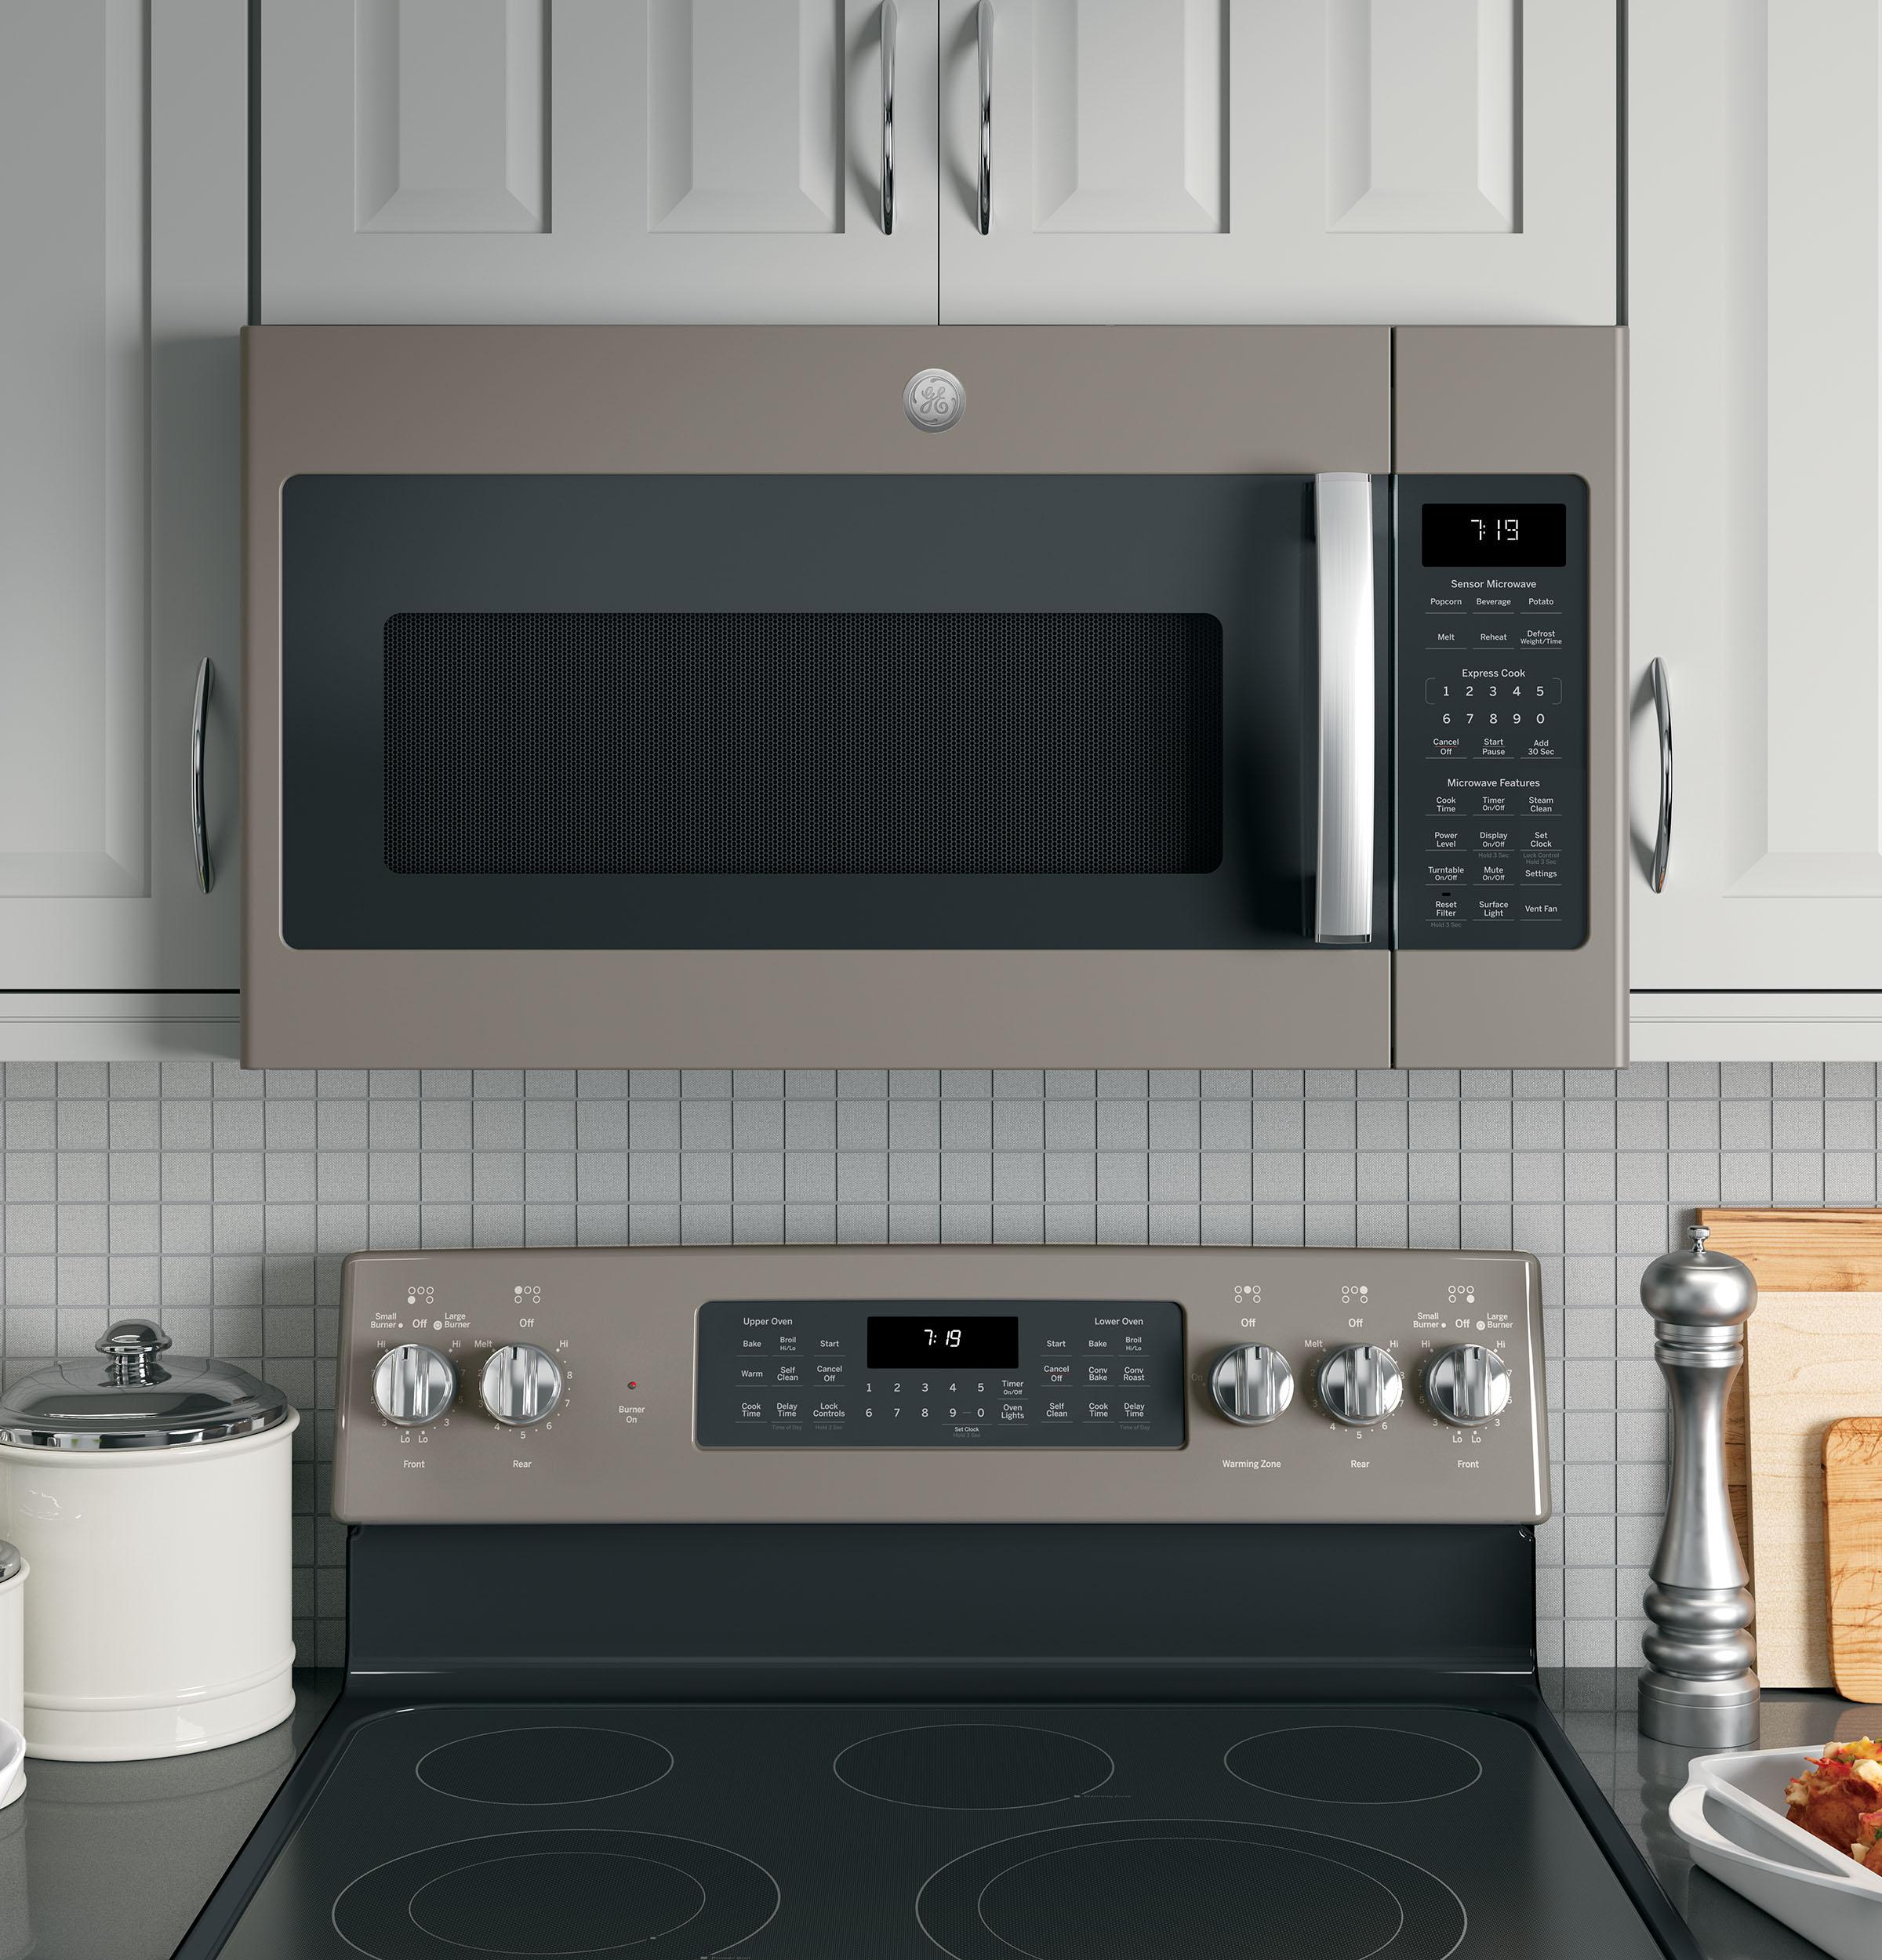 Model: JVM7195EKES | GE GE® 1.9 Cu. Ft. Over-the-Range Sensor Microwave Oven